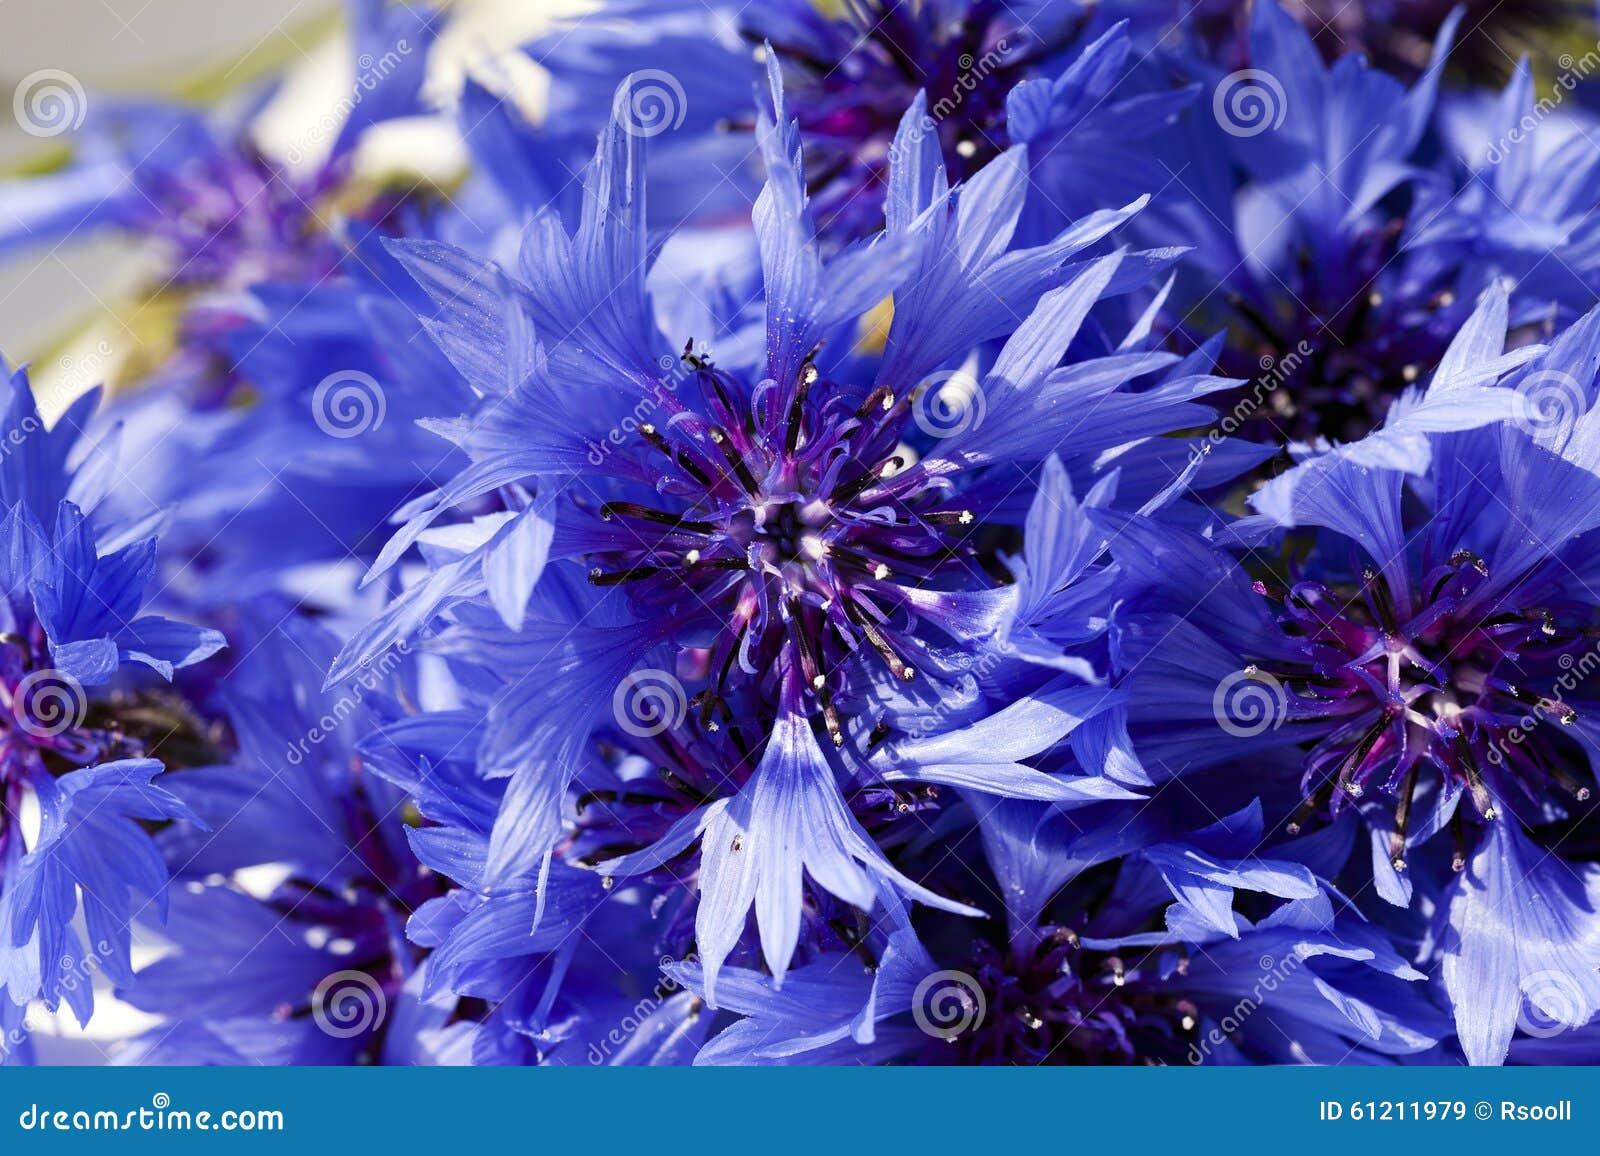 Cornflower Blue Flowers Stock Image Image Of Meadow 61211979